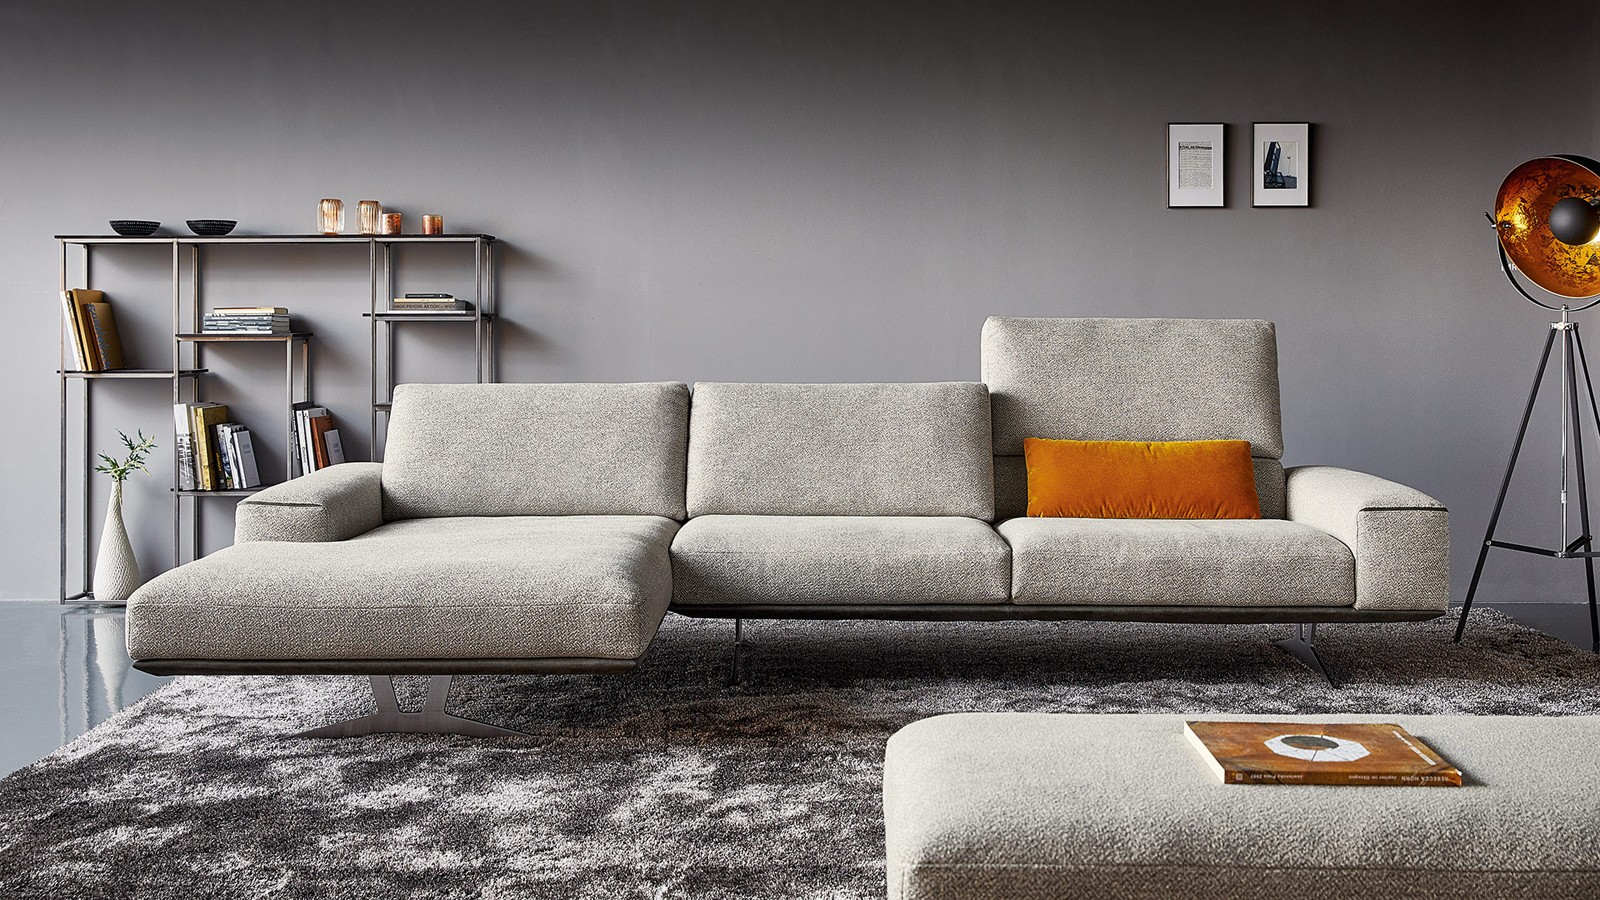 Canapea modernă Koinor Harlie